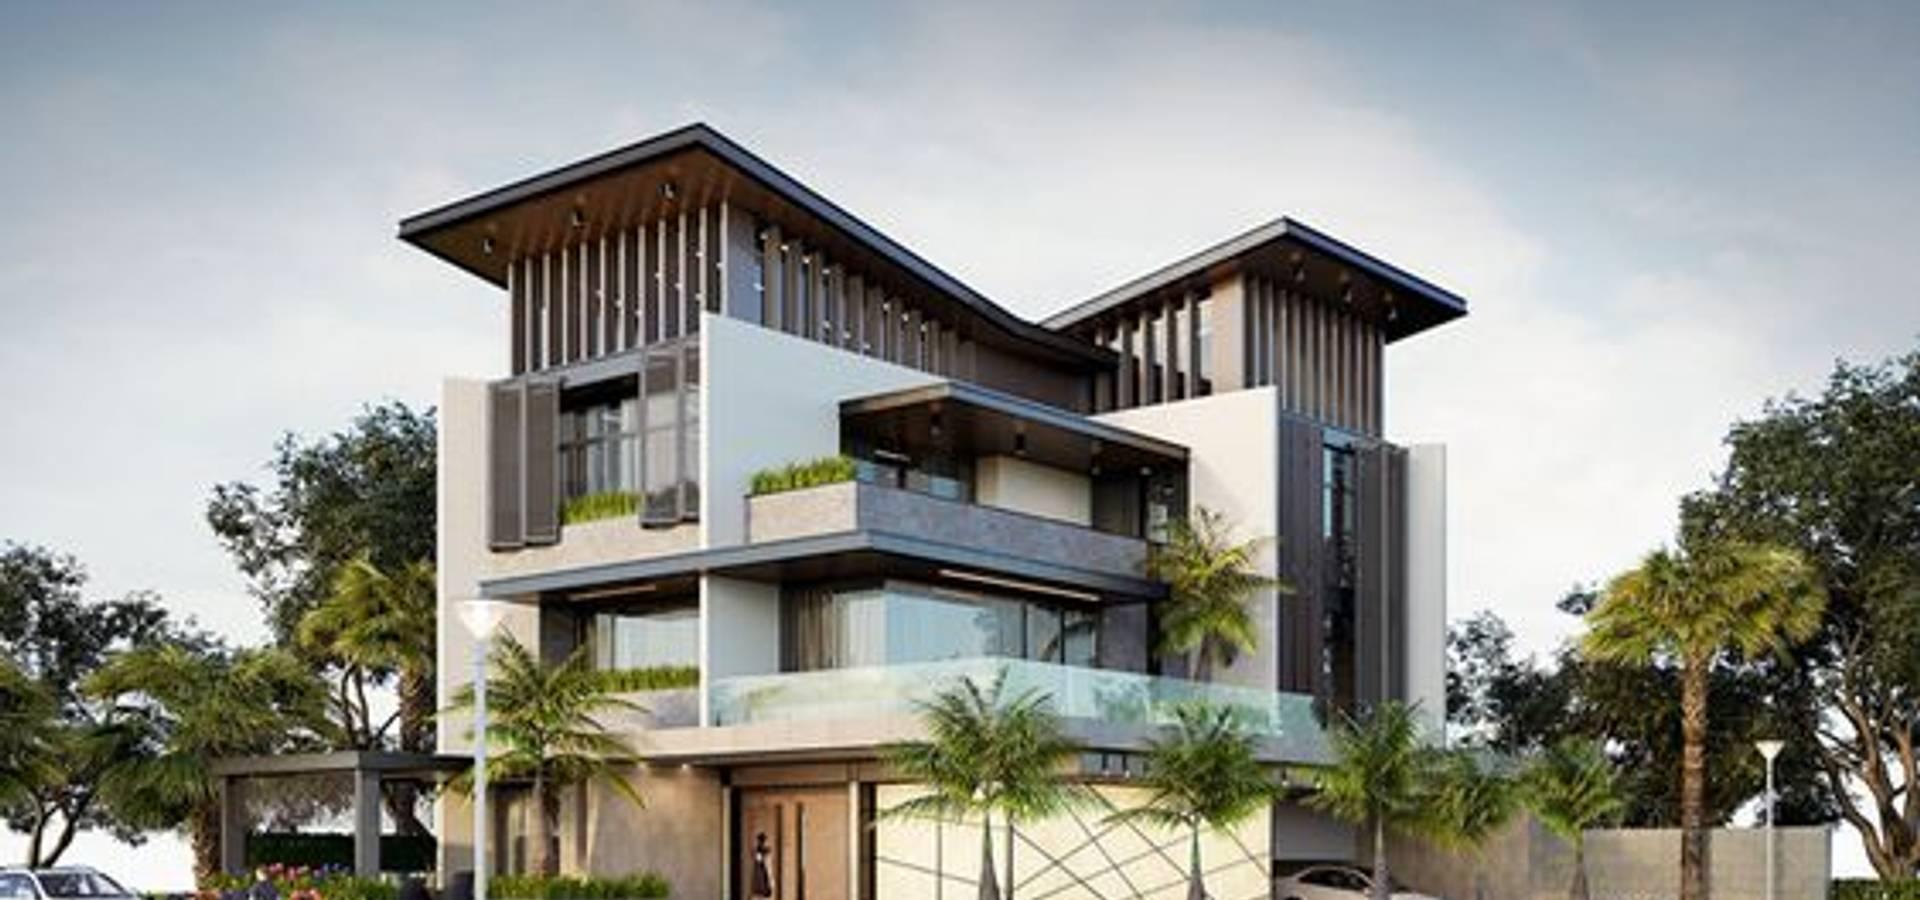 Kiến trúc Hoa Vinh